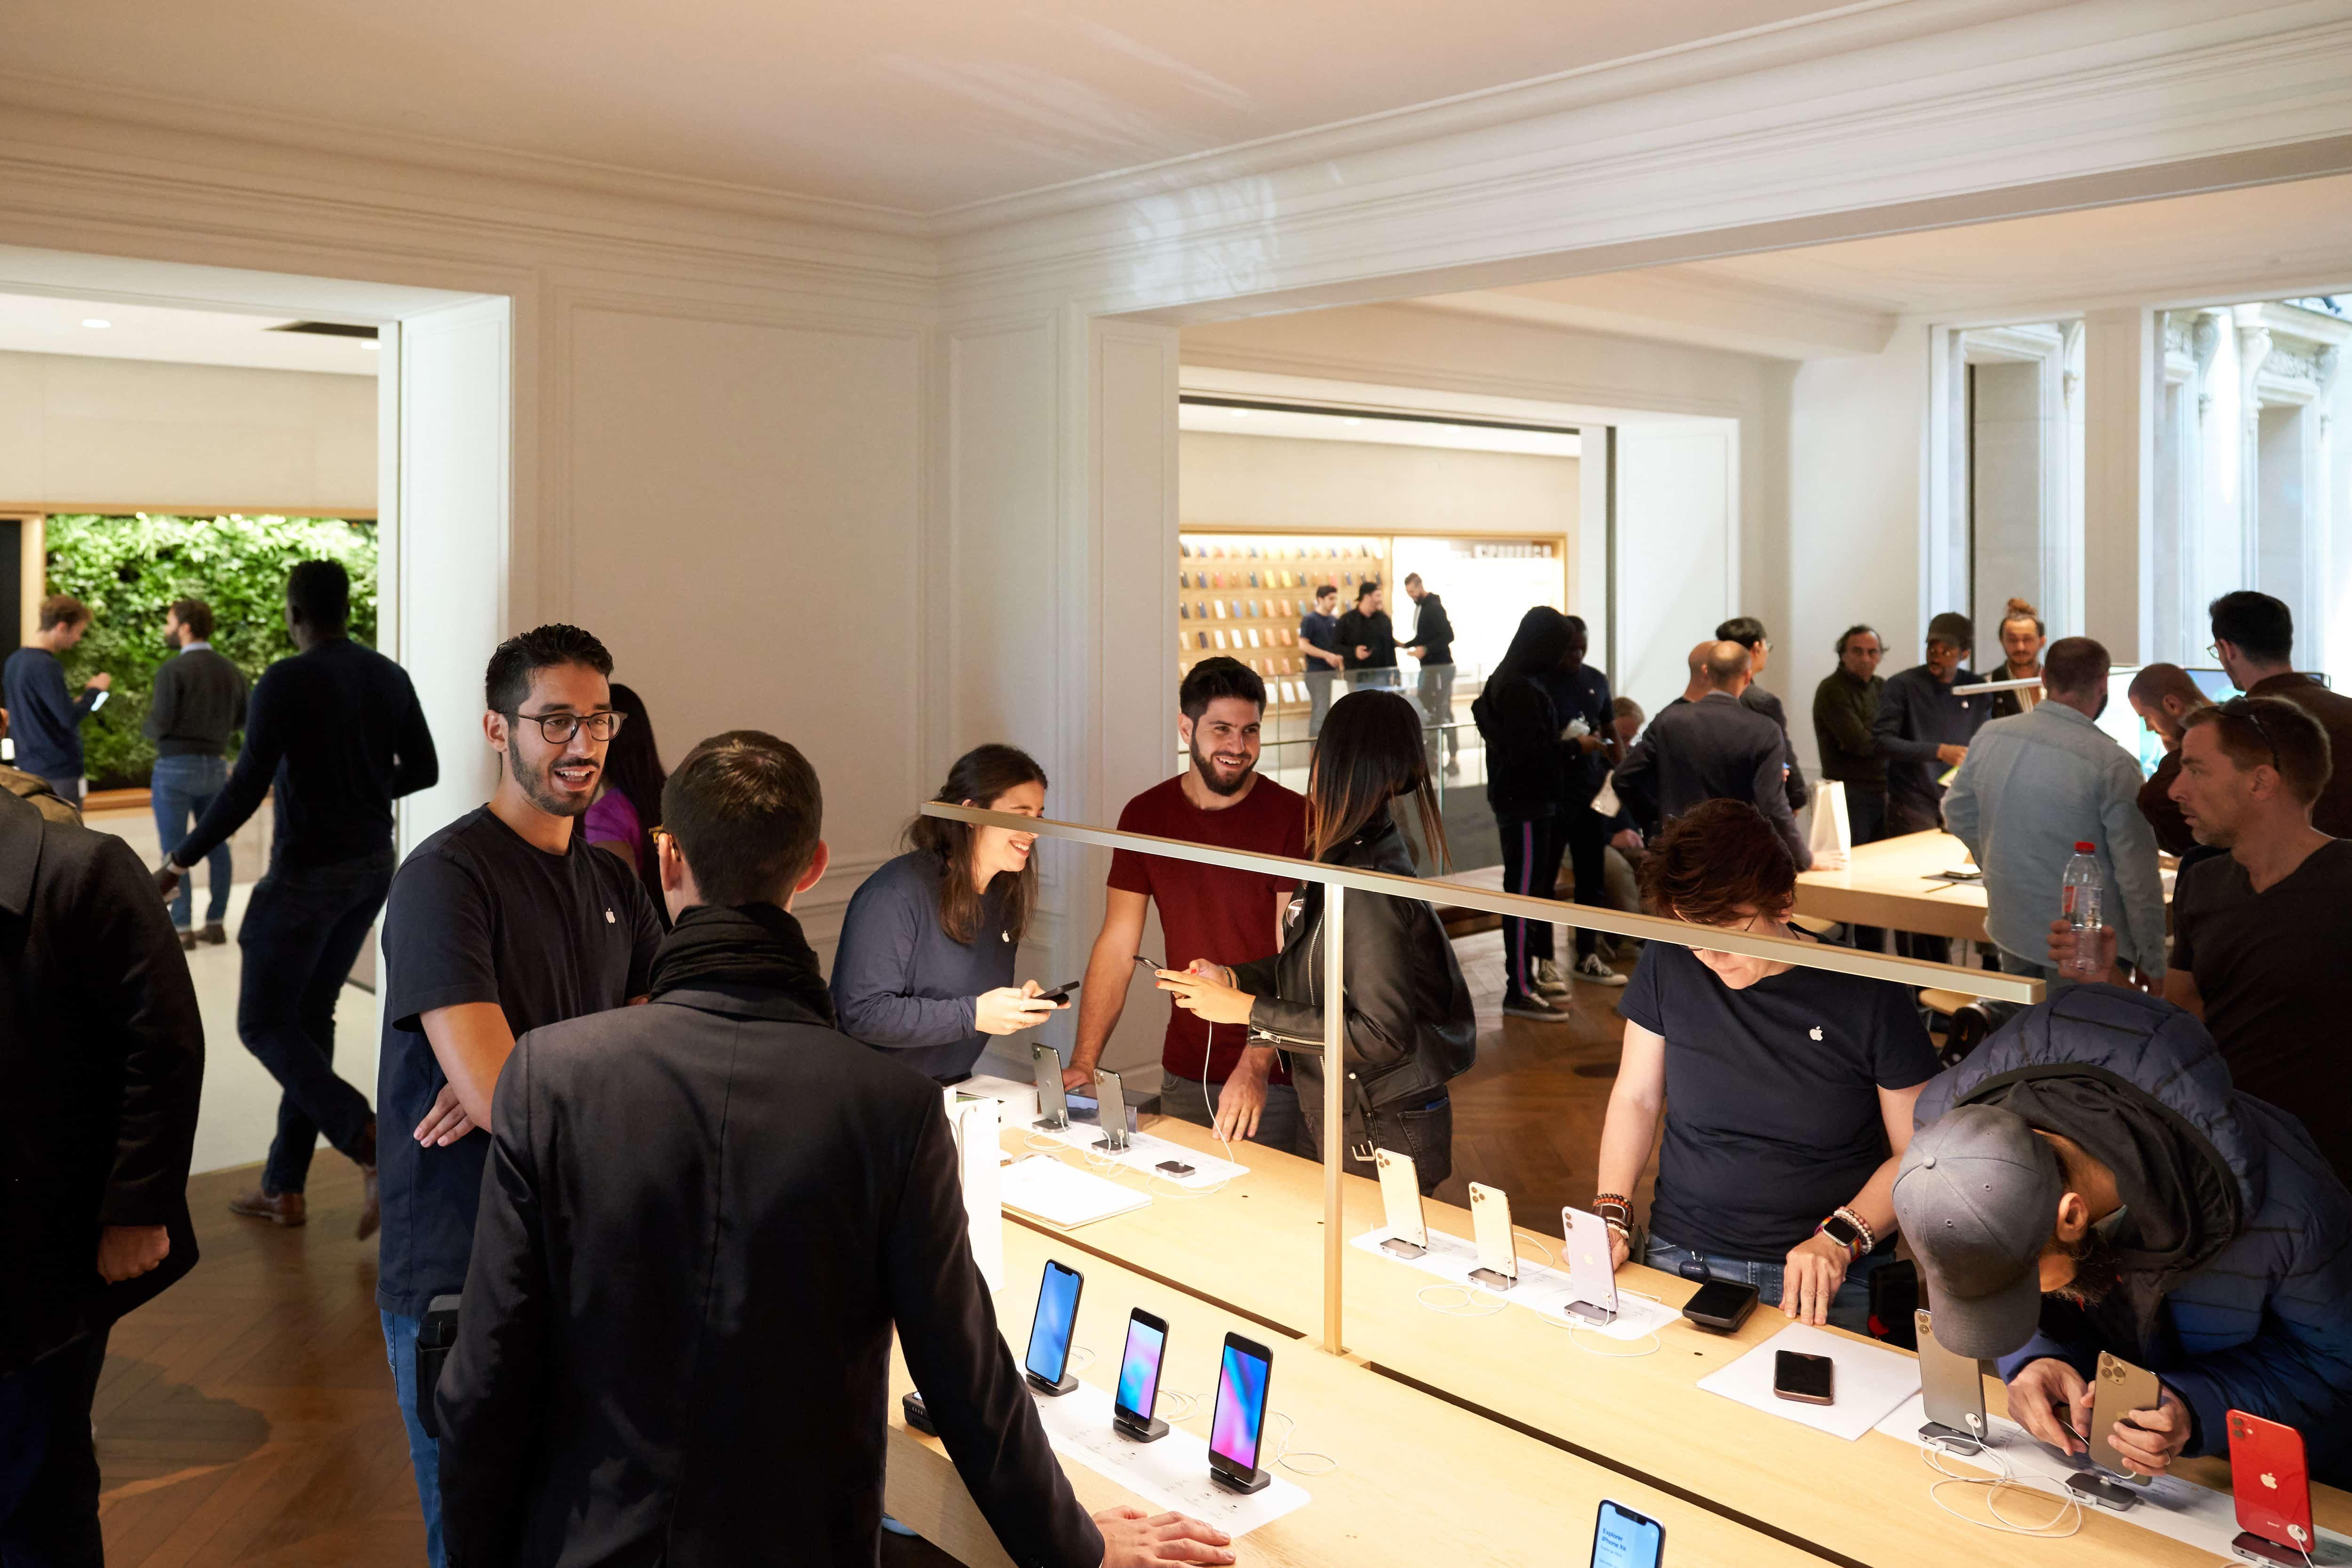 Apple Iphone 11 Pro Apple Watch 5 Availability Paris Customers Inside Champs Elysses 092019